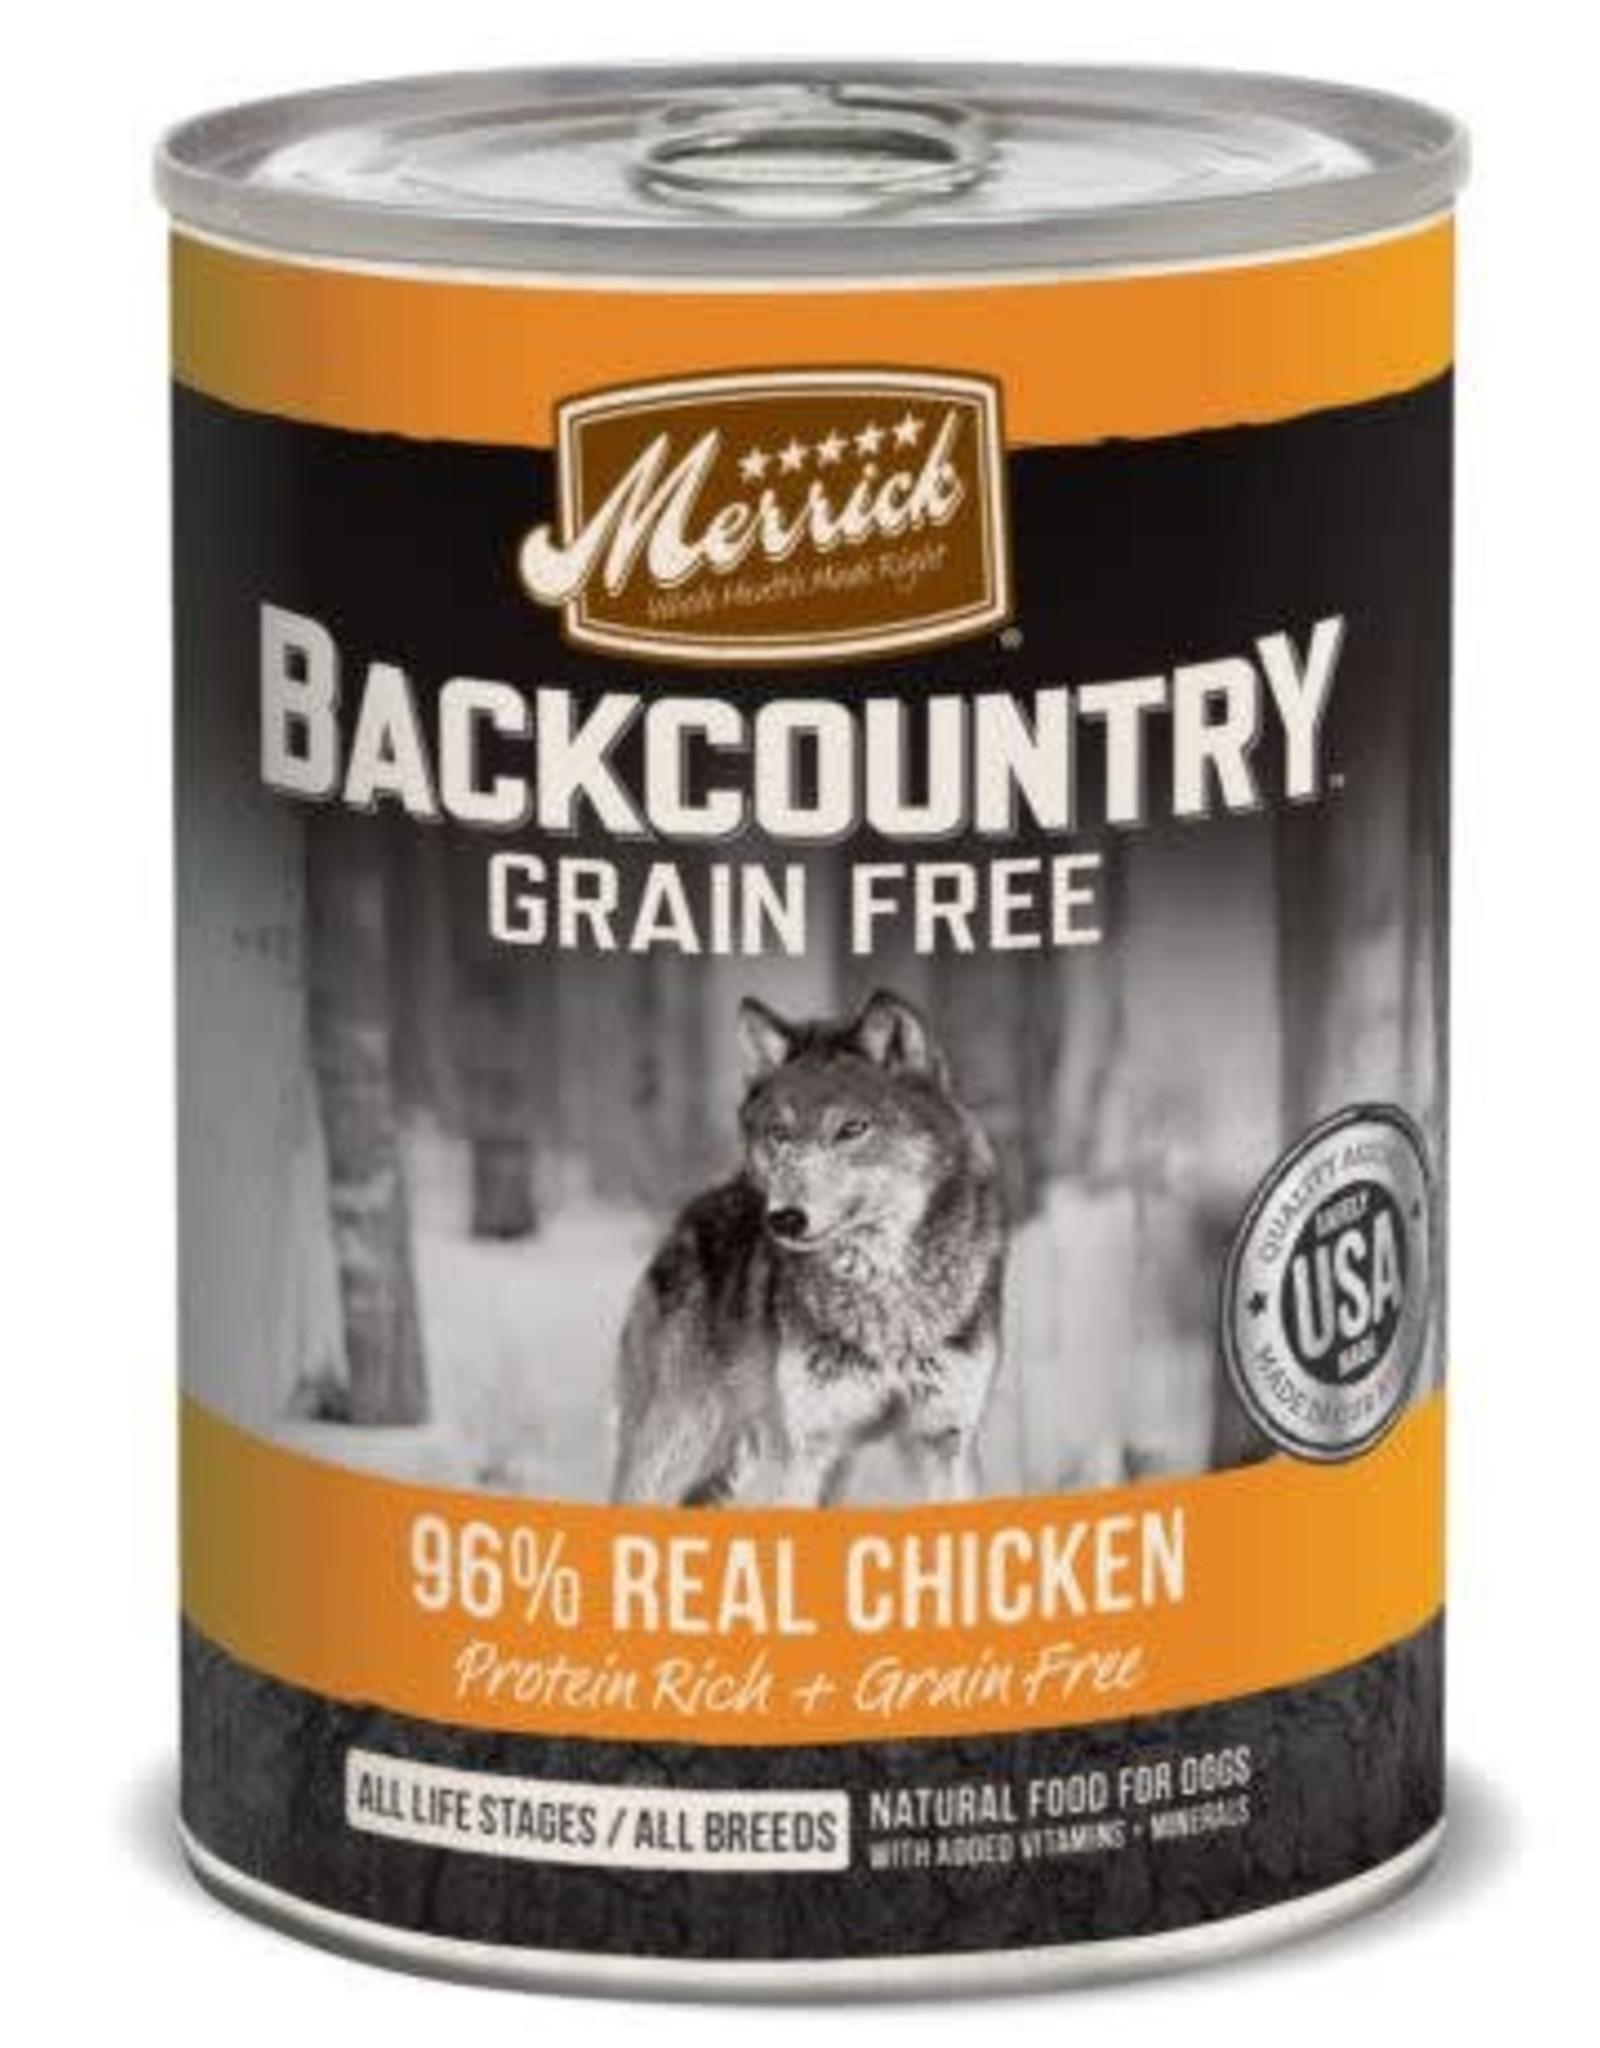 Merrick Merrick Backcountry Grain-Free 96% Real Chicken Dog 12.7 oz